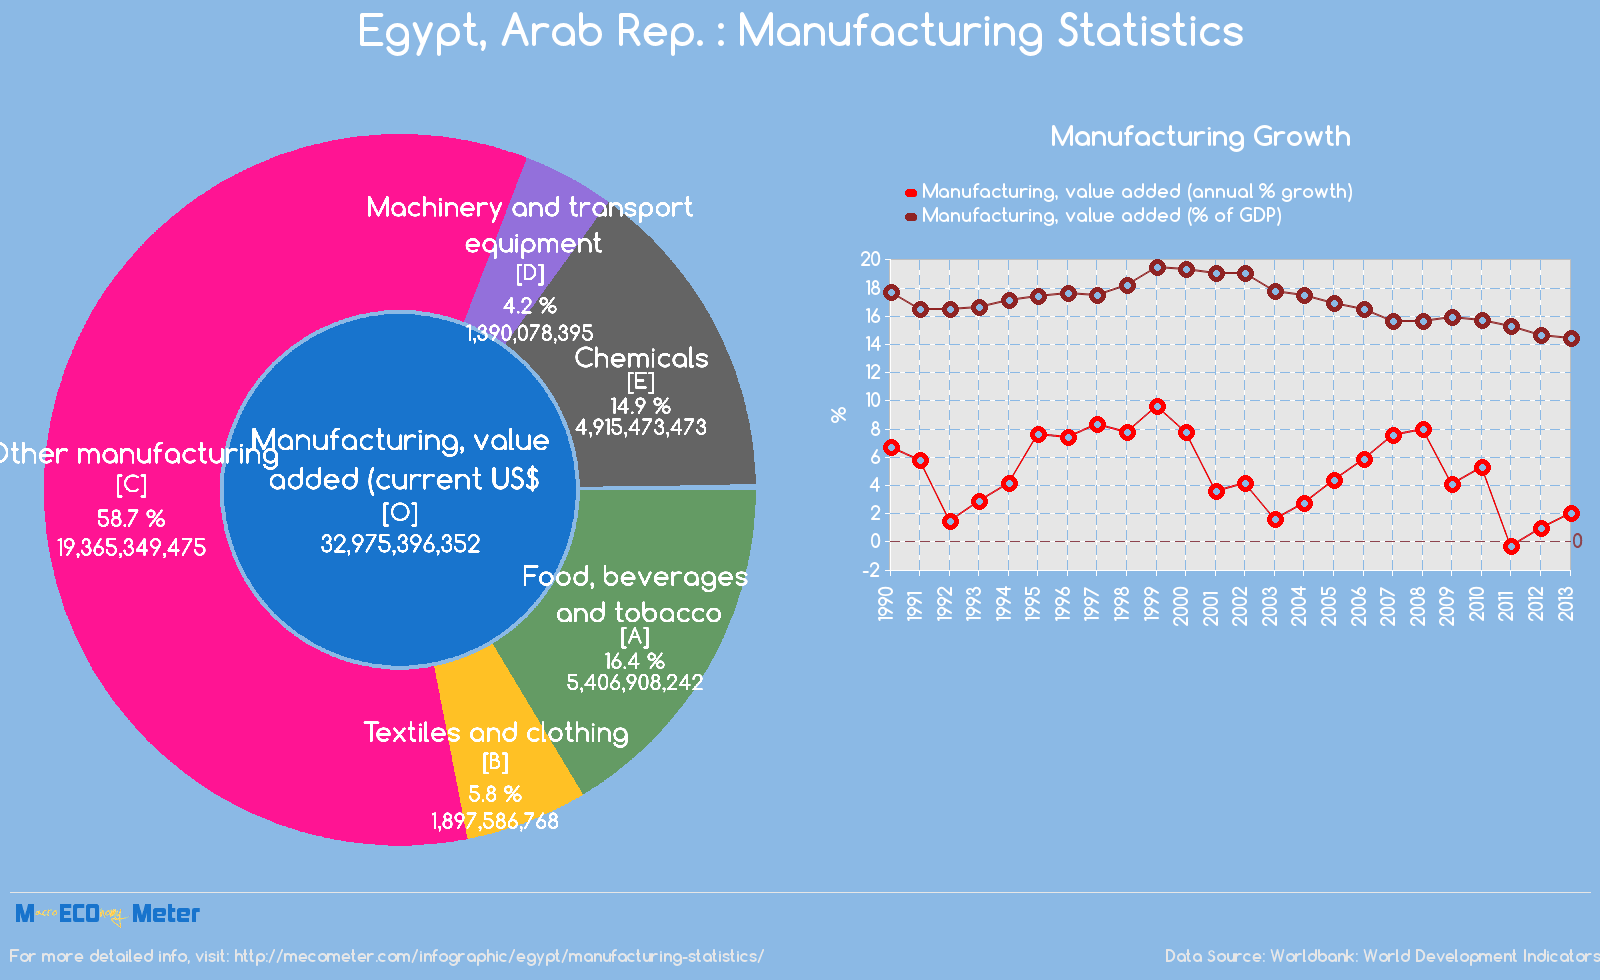 Egypt, Arab Rep. : Manufacturing Statistics